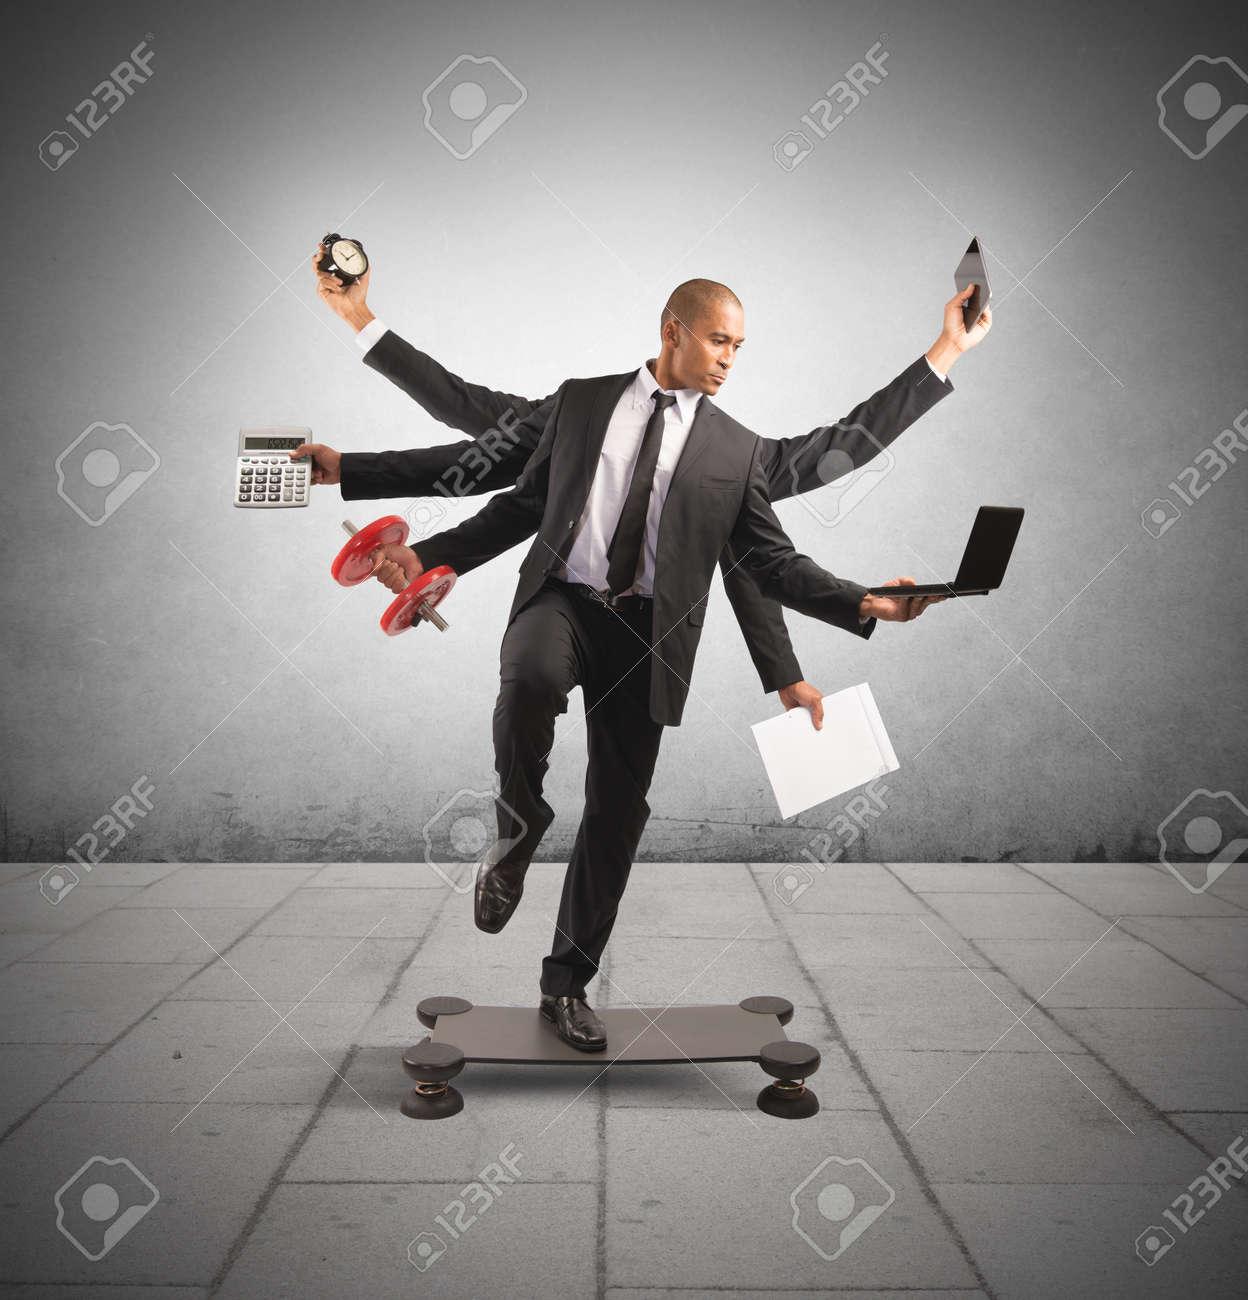 Multitasking concept with businessman at work doing gymnastics - 27430415